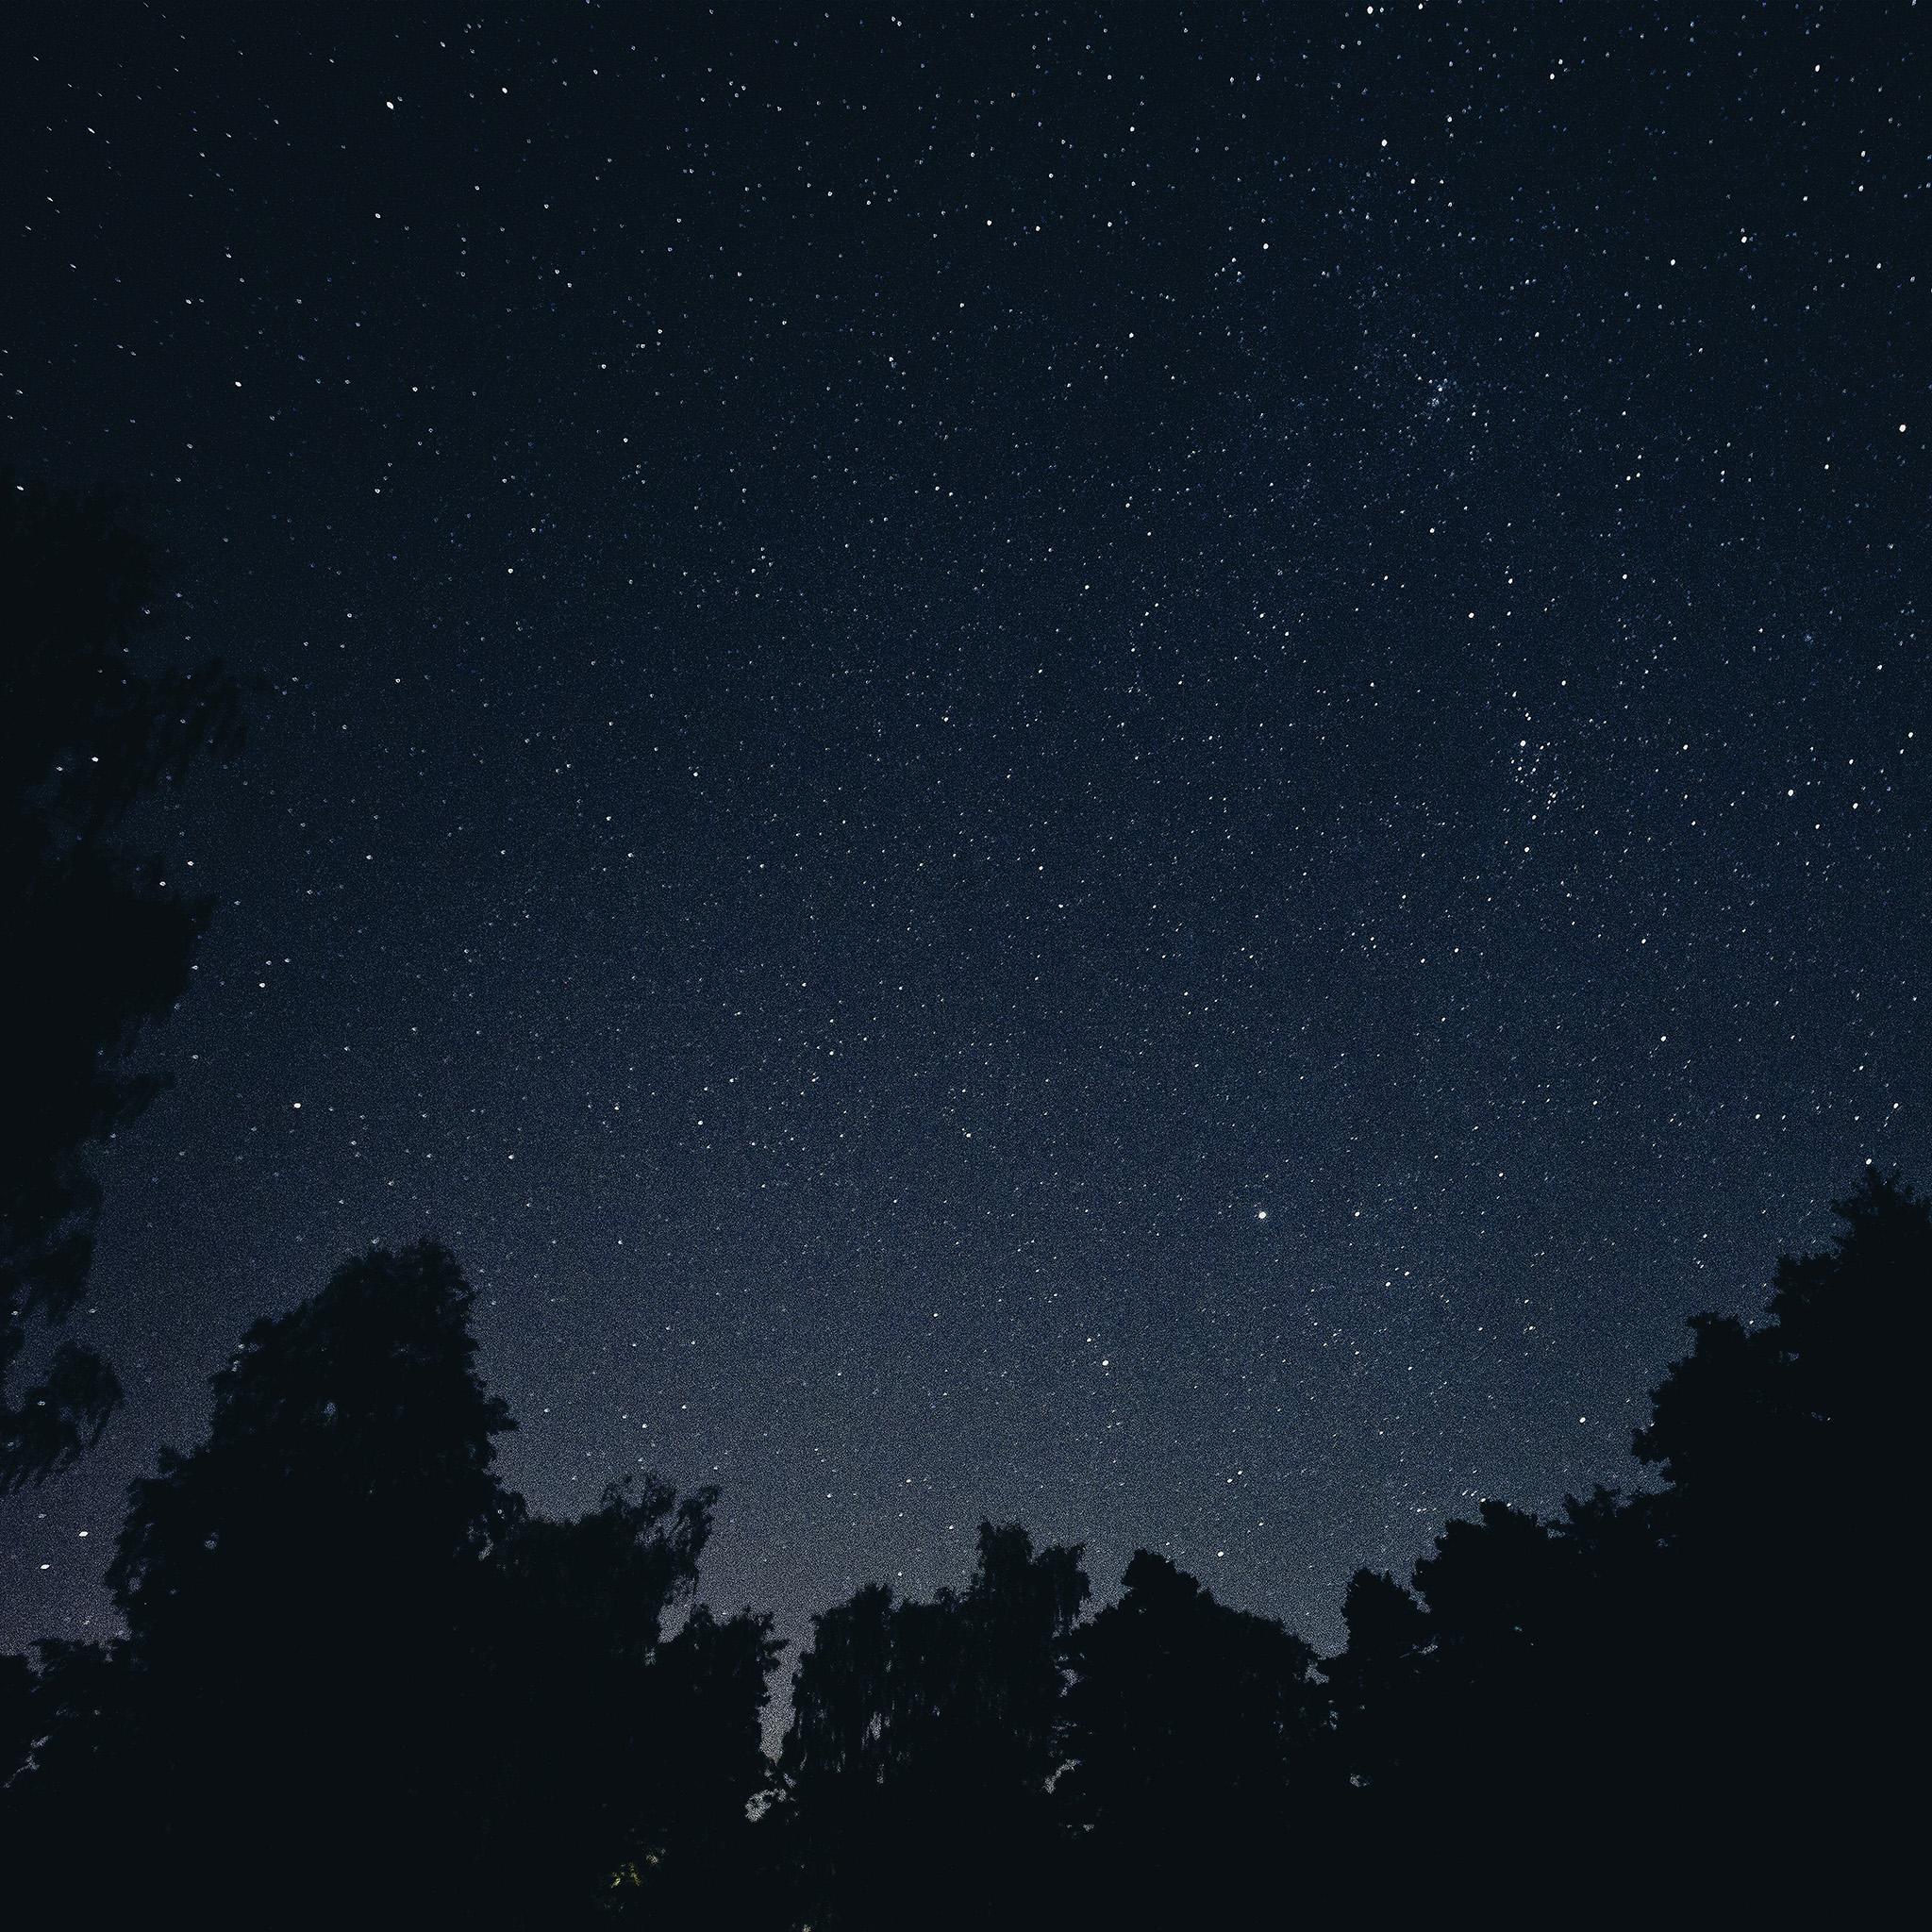 Starry Fall Night Wallpaper Wallpapers